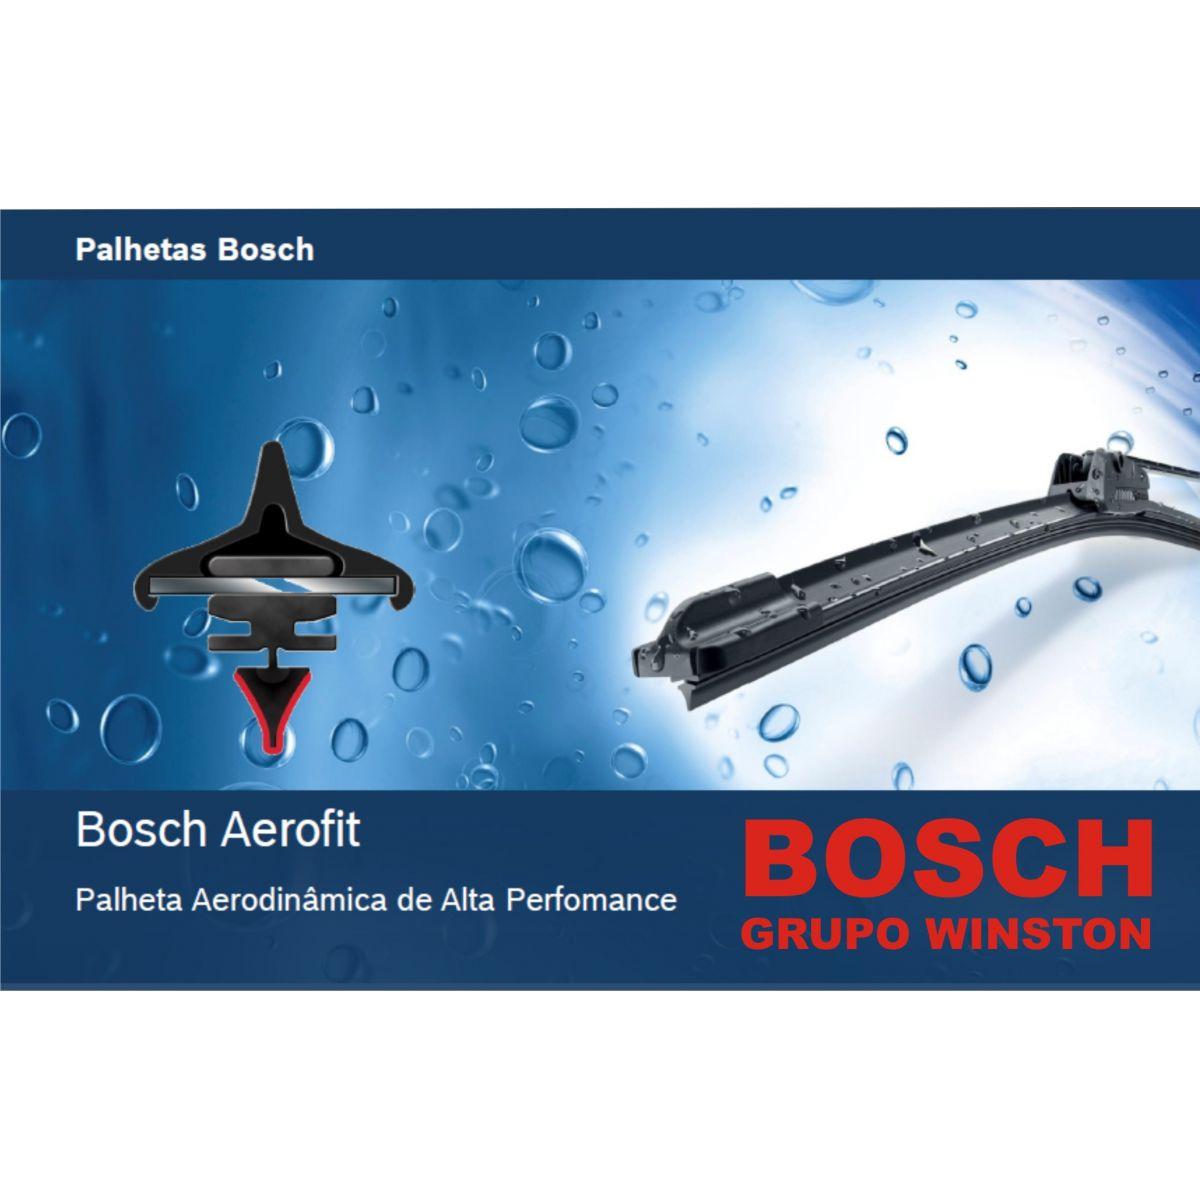 Palheta Bosch Aerofit Limpador de para brisa Bosch NISSAN Frontier